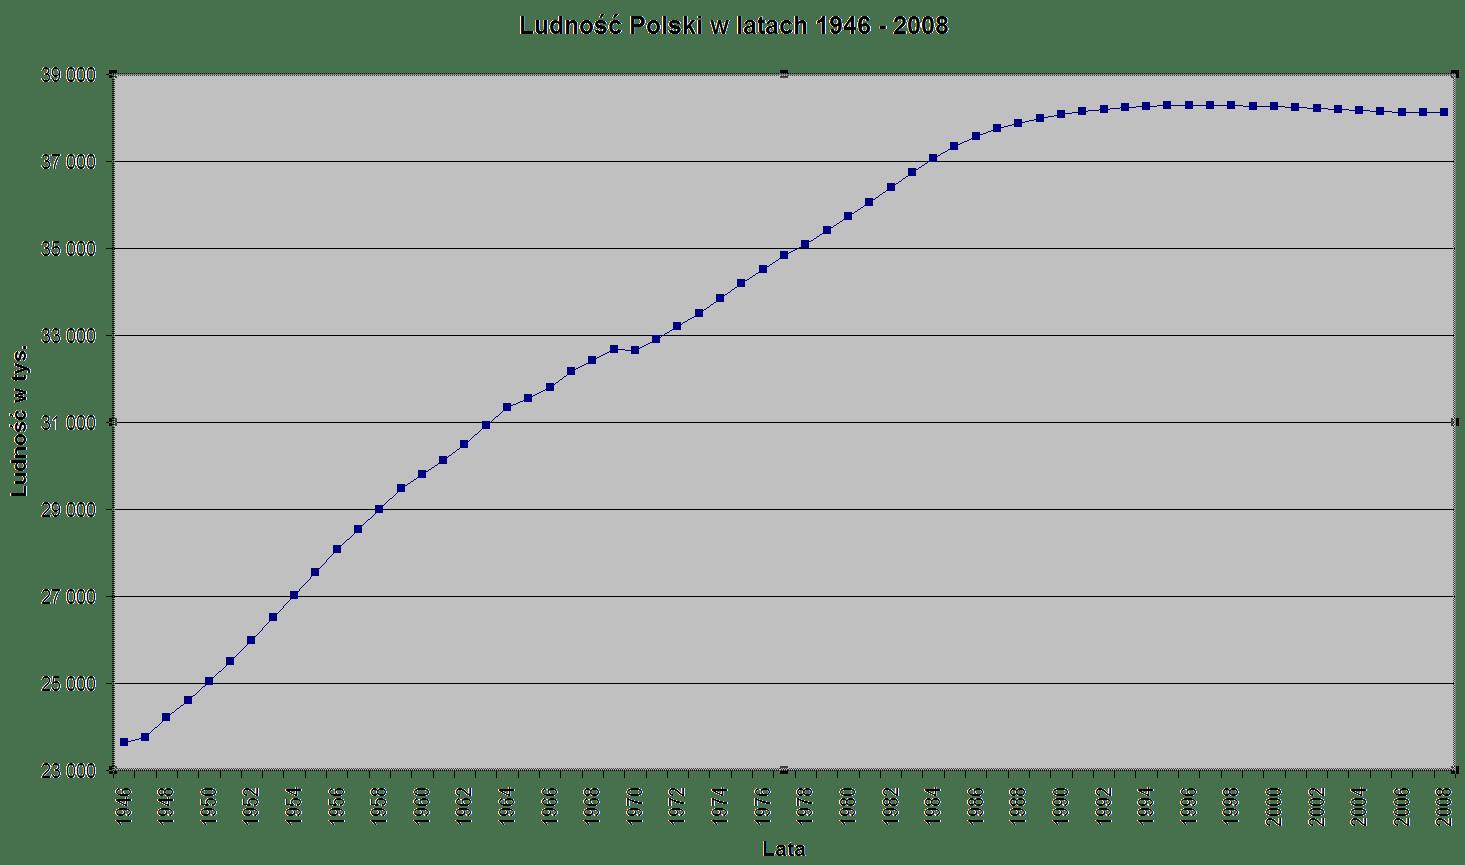 Poland-demography_1946-2008.png